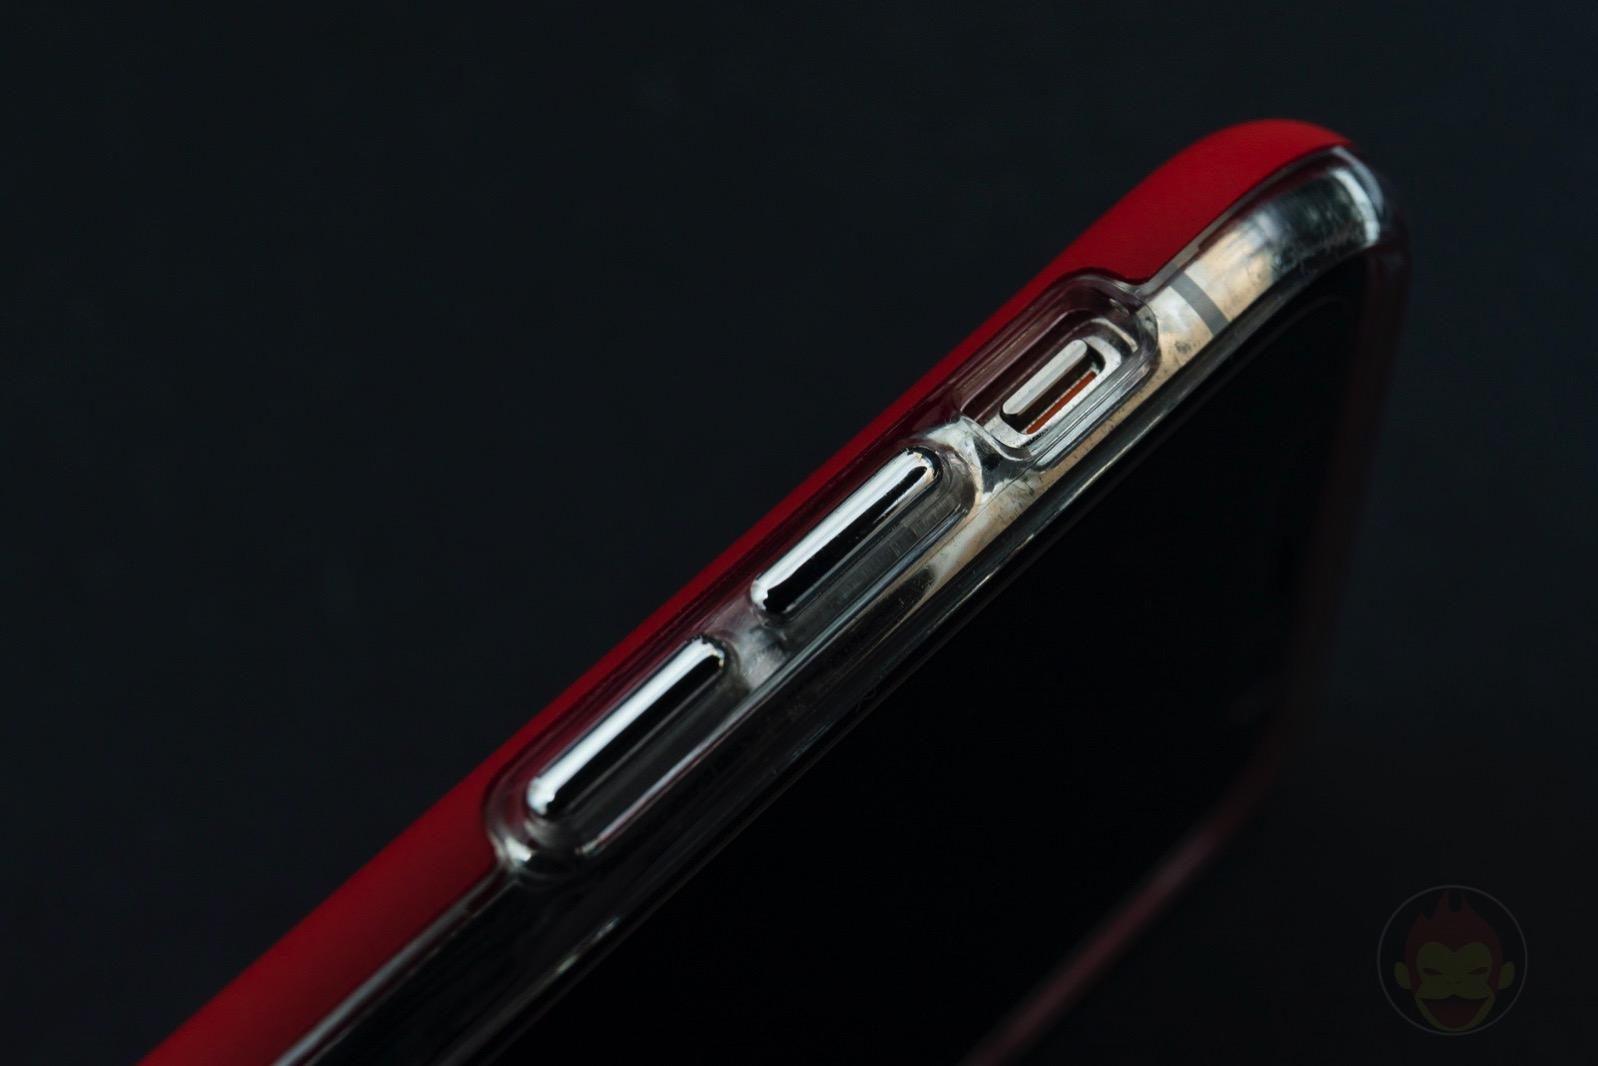 PhoneFoam-Dual-Skin-iPhoneX-Case-08.jpg